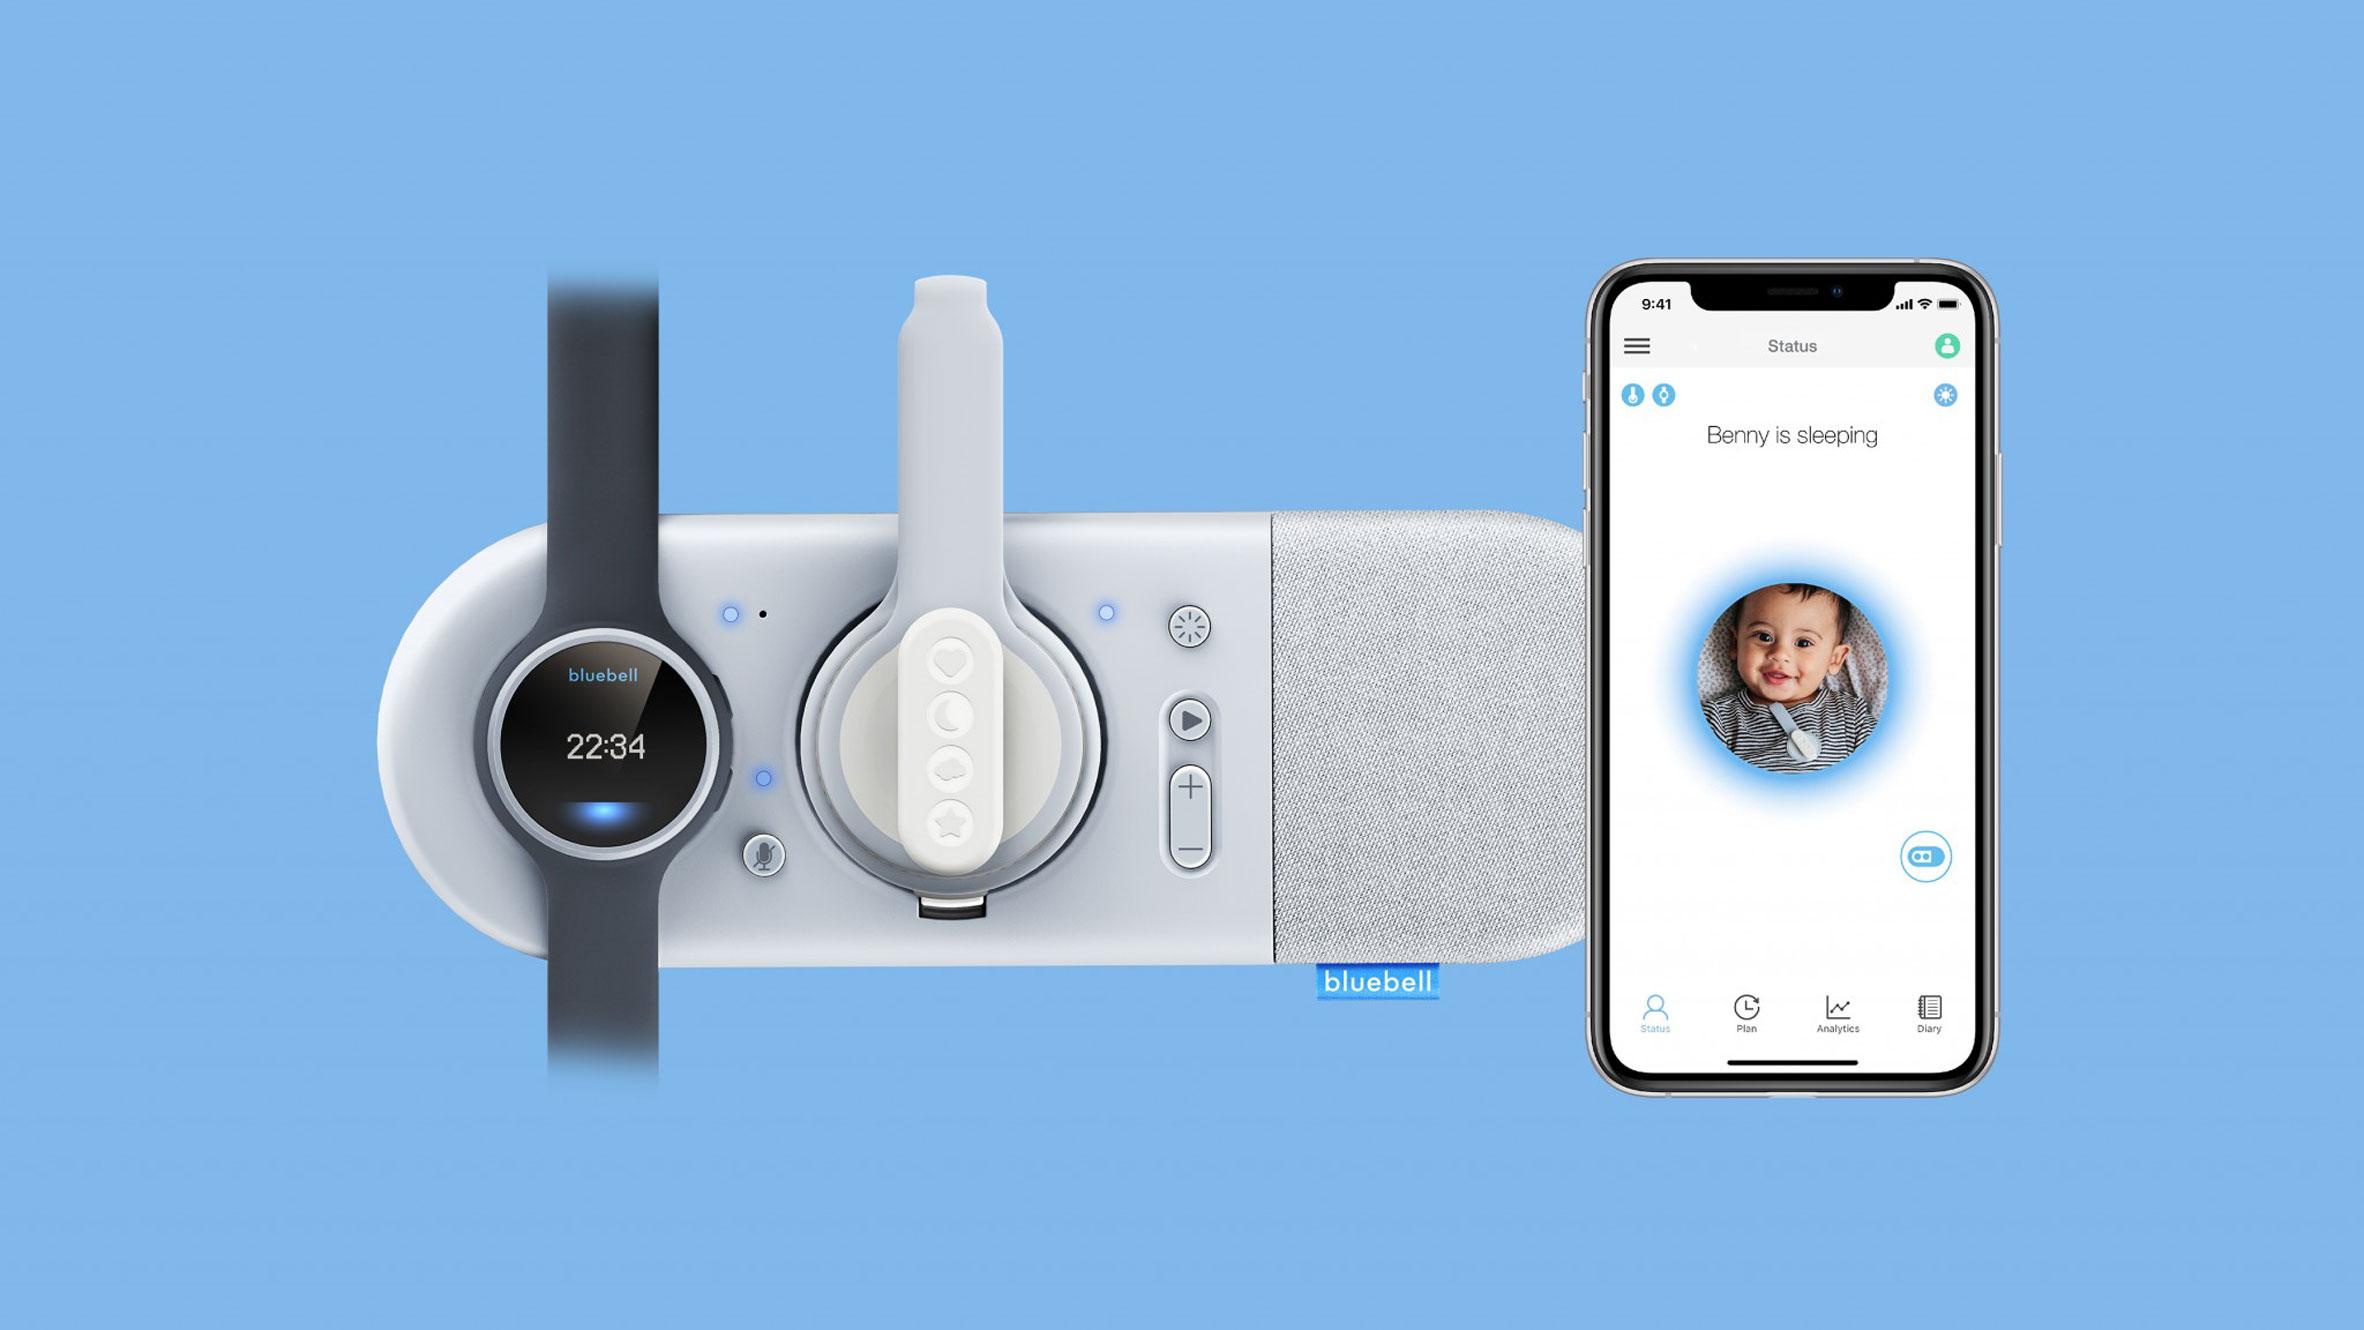 Bluebell smart monitor by Tangerine